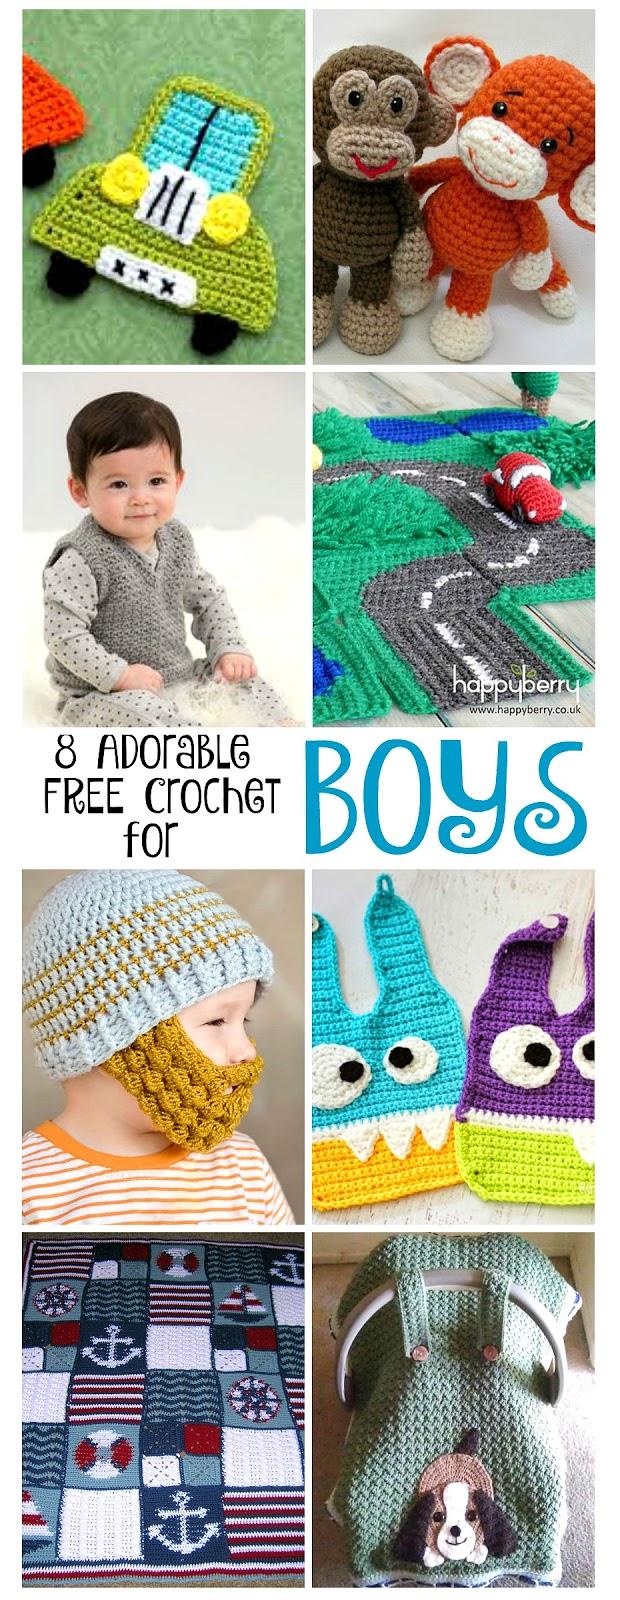 8 Adorable Free Crochet Patterns For Boys Grateful Prayer